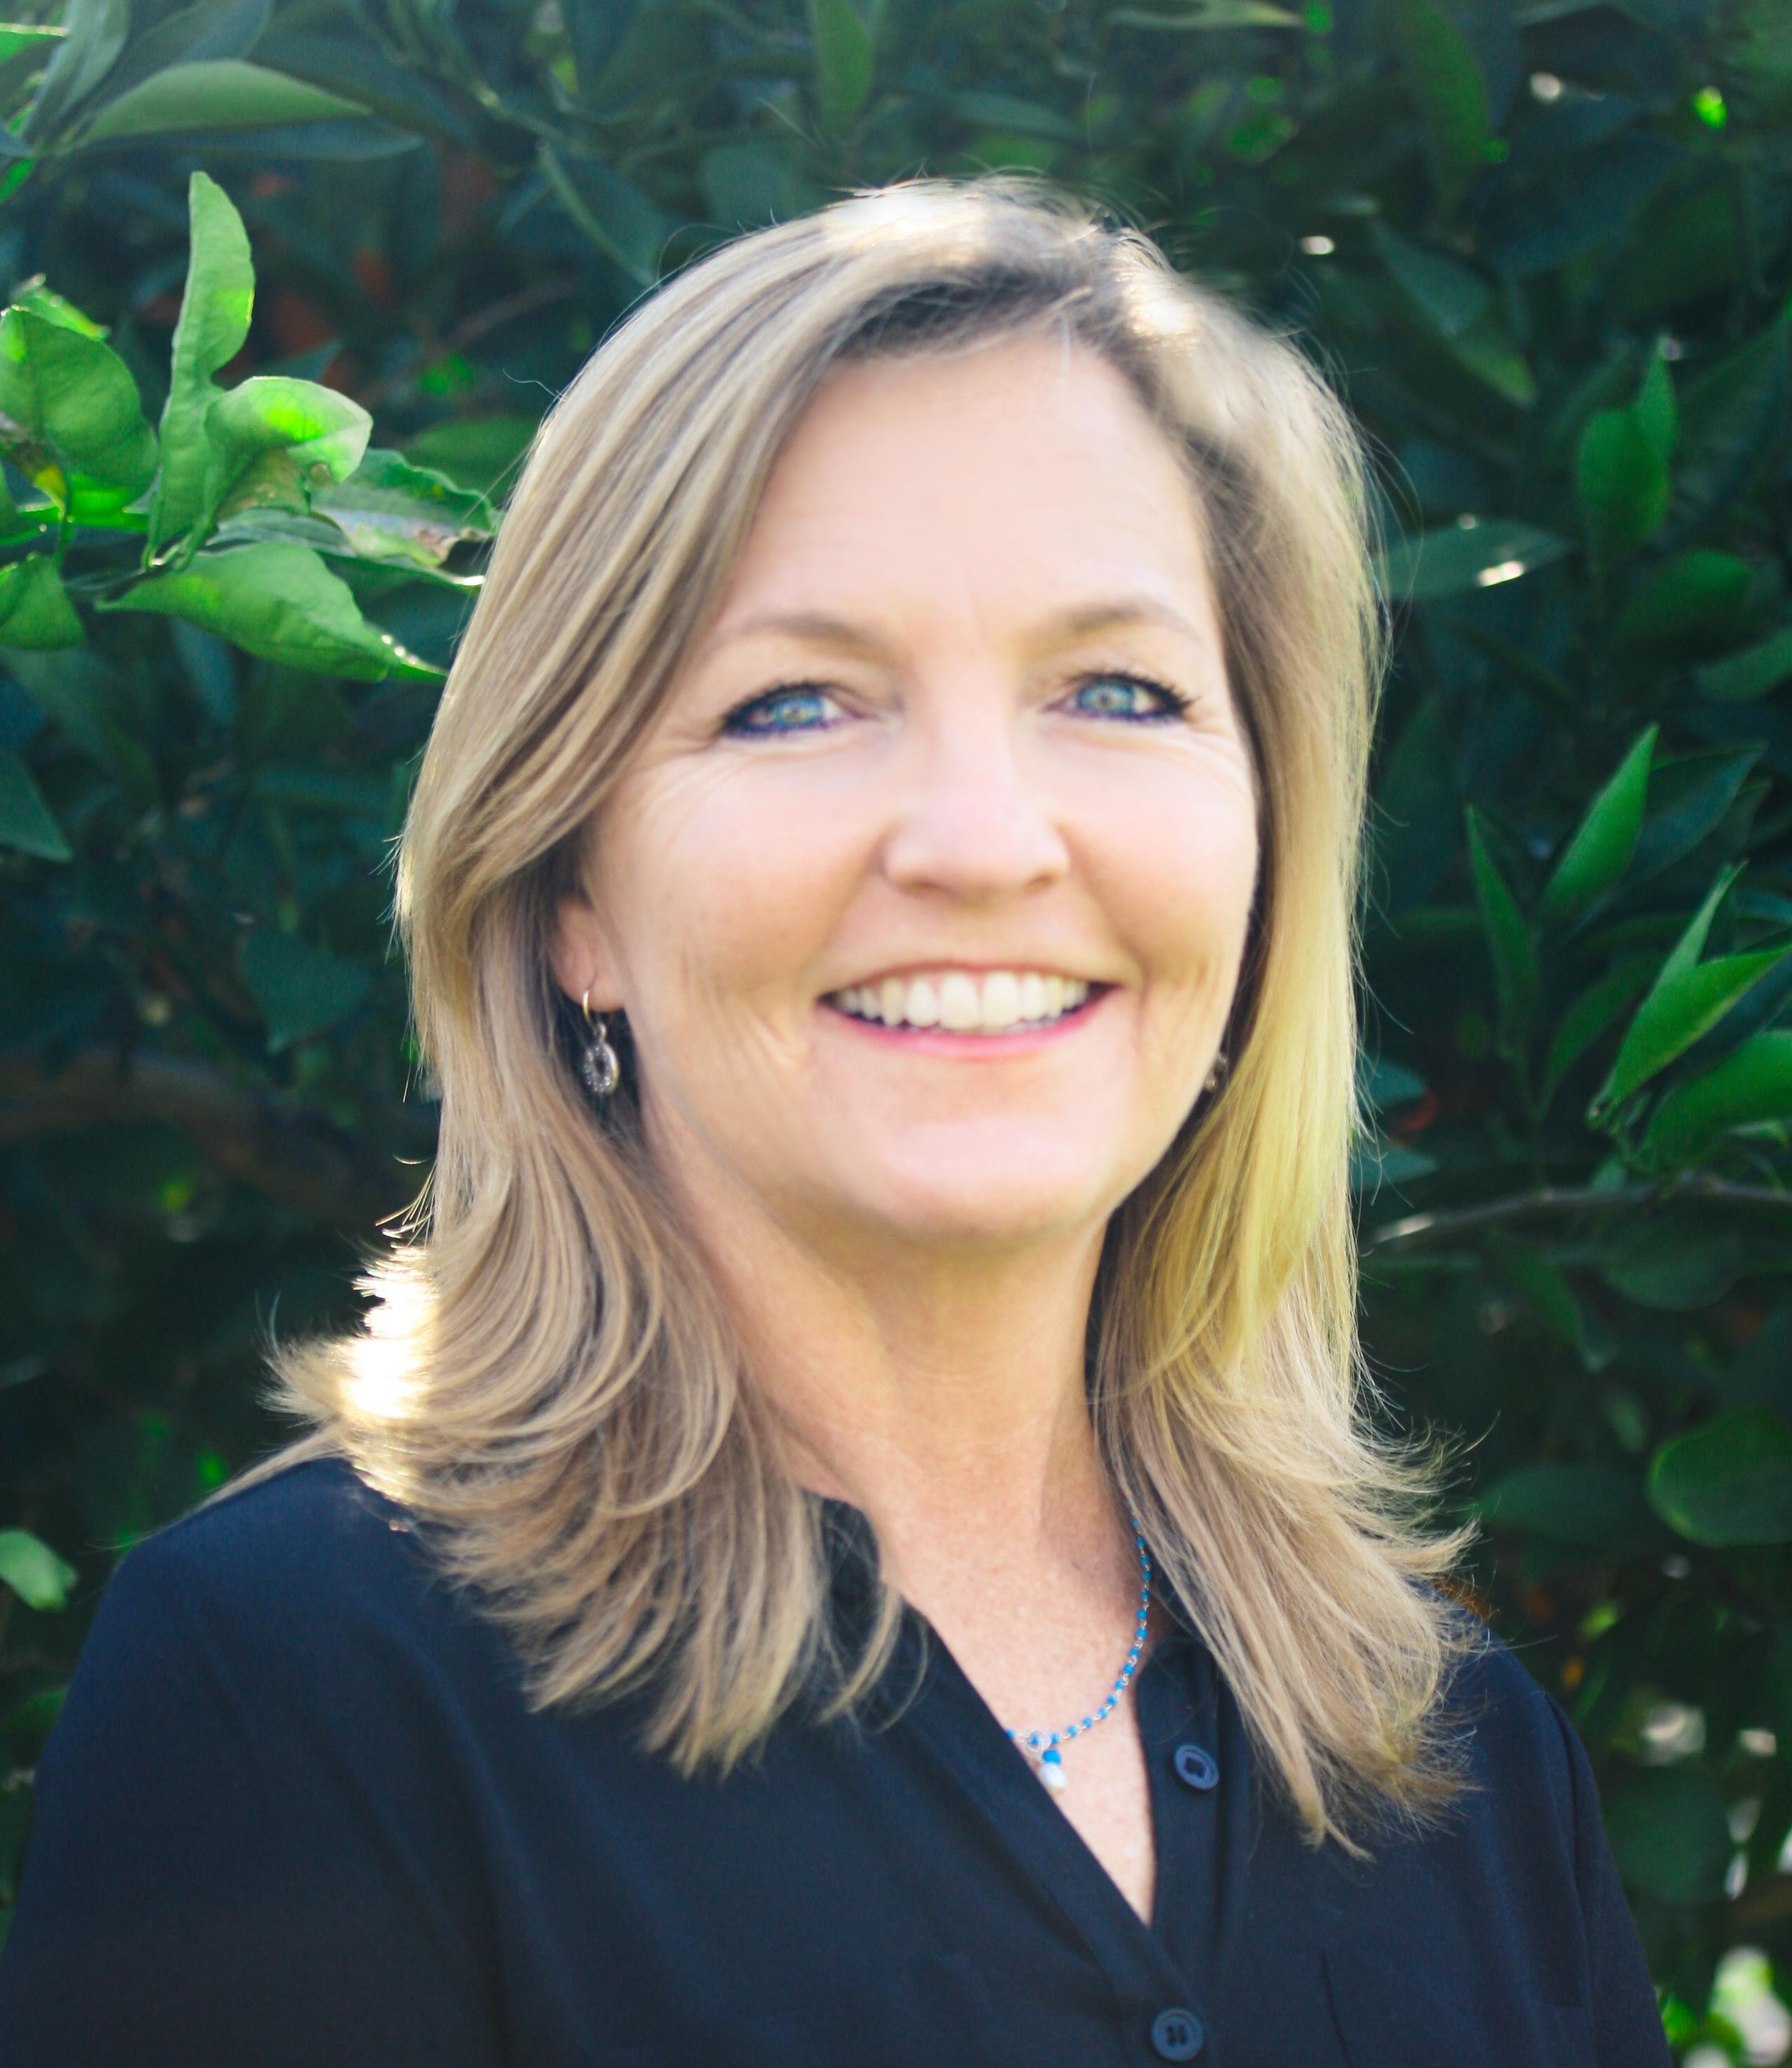 Nancy Villemez is a licensed real estate agent in Phoenix AZ